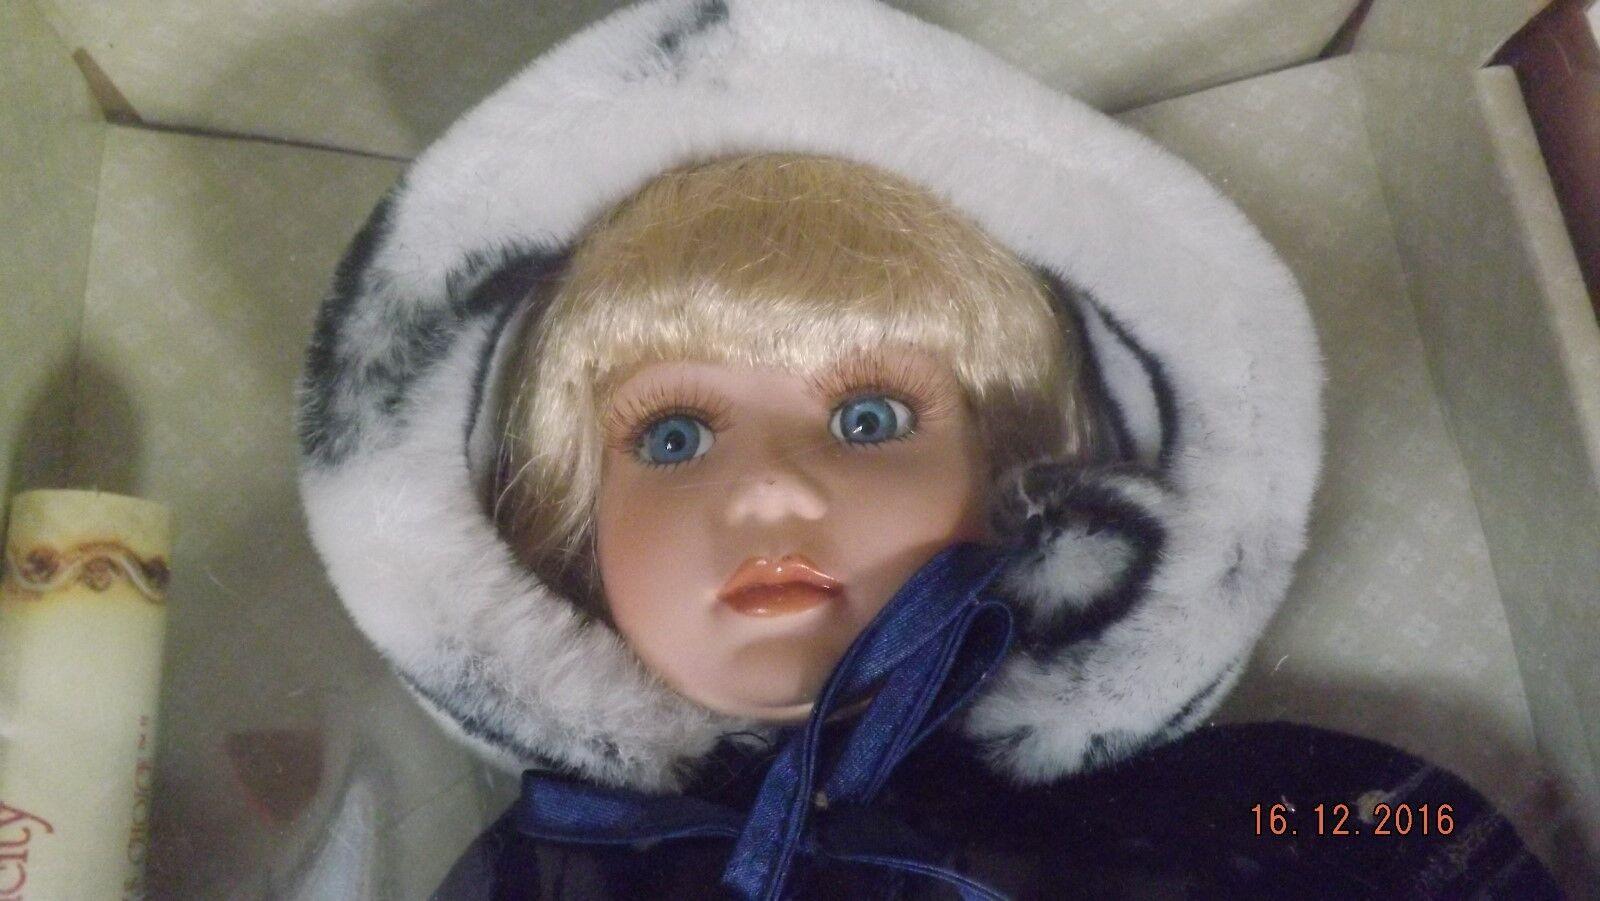 Art Dolls-ooak Dolls Top Zustand Generous Künstlerpuppe Porzellan Puppe 36 Cm